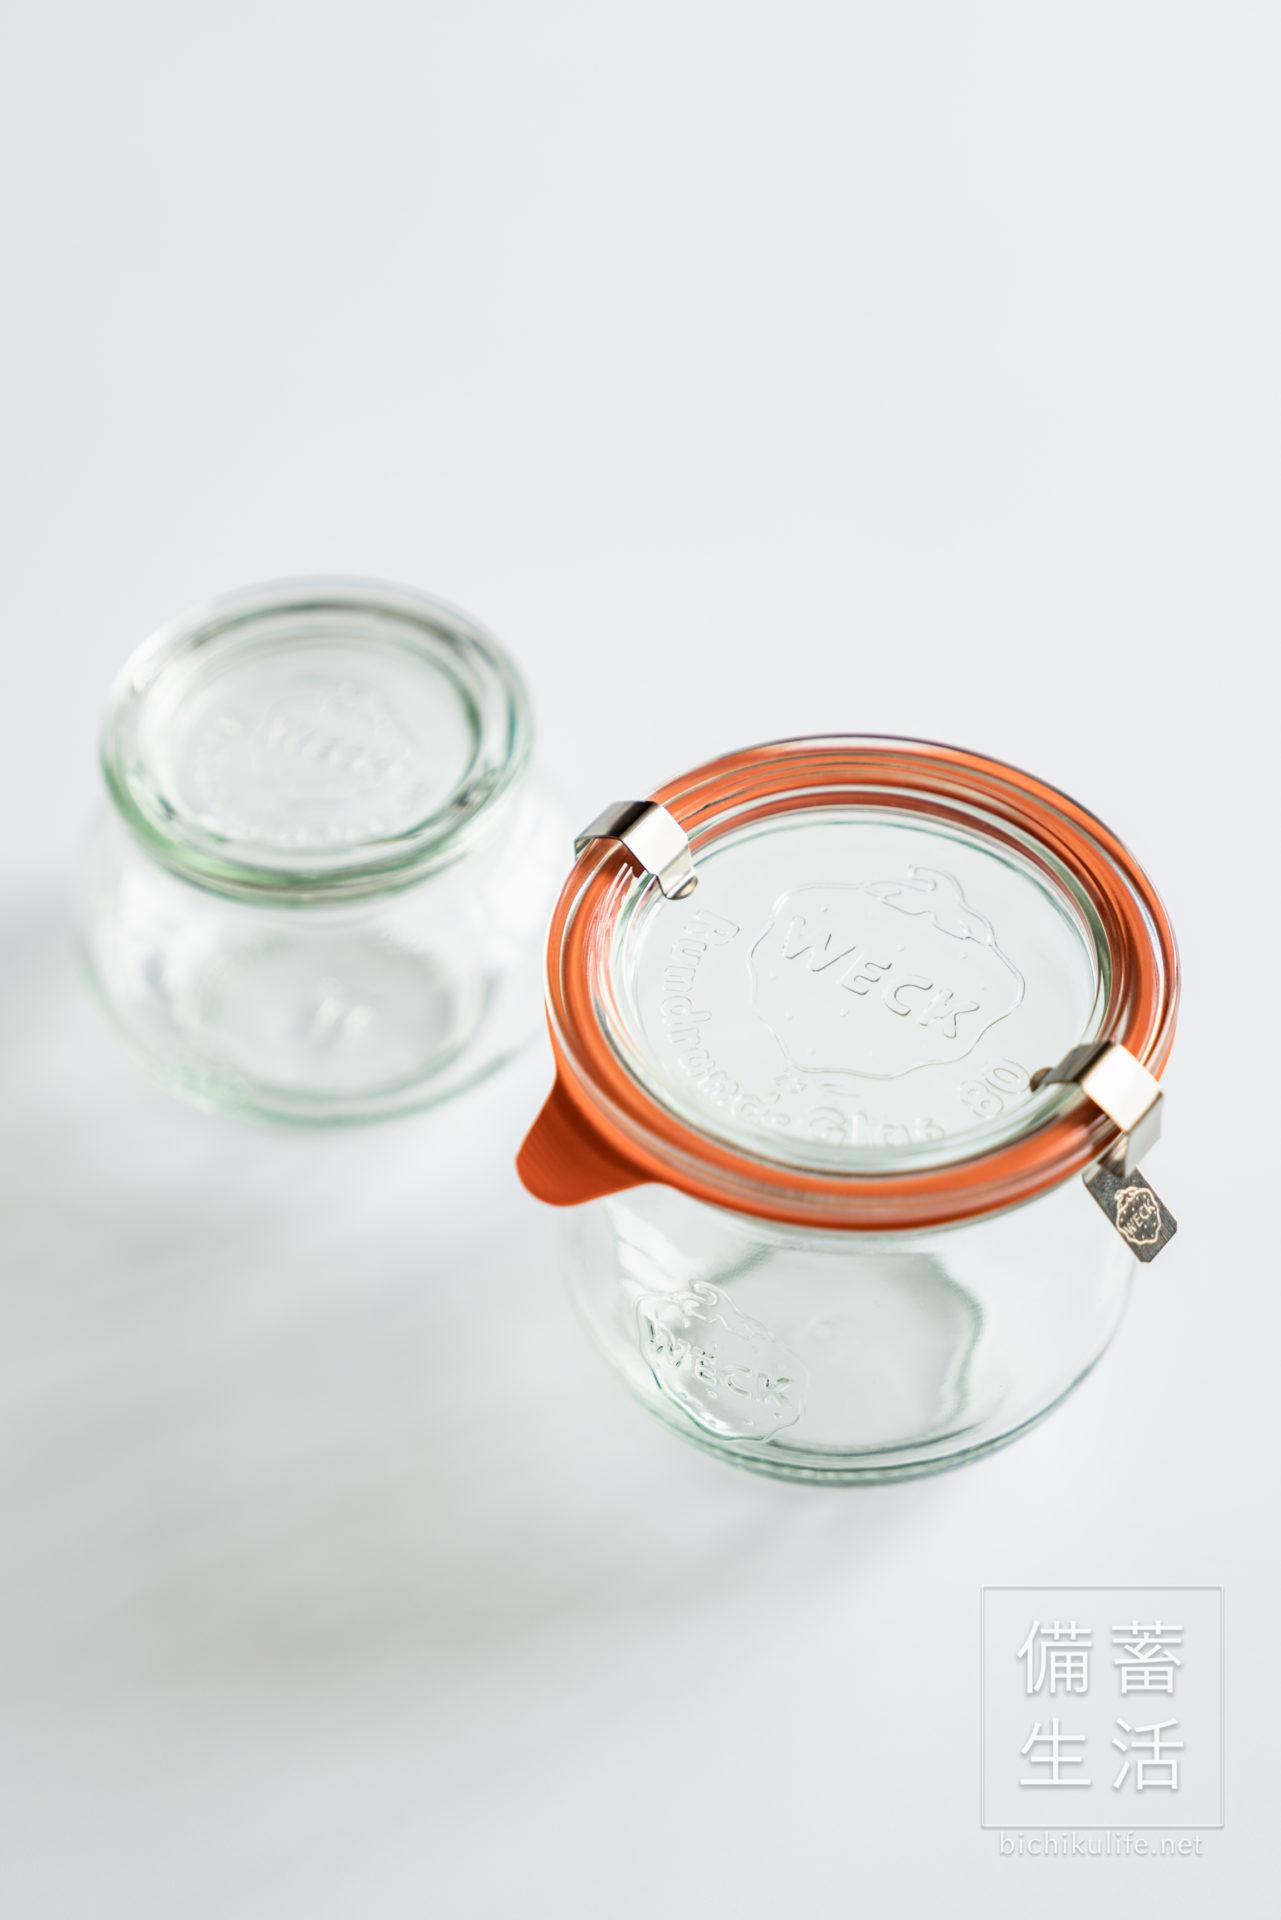 weck、WECK ウェックのガラス保存瓶、保存容器